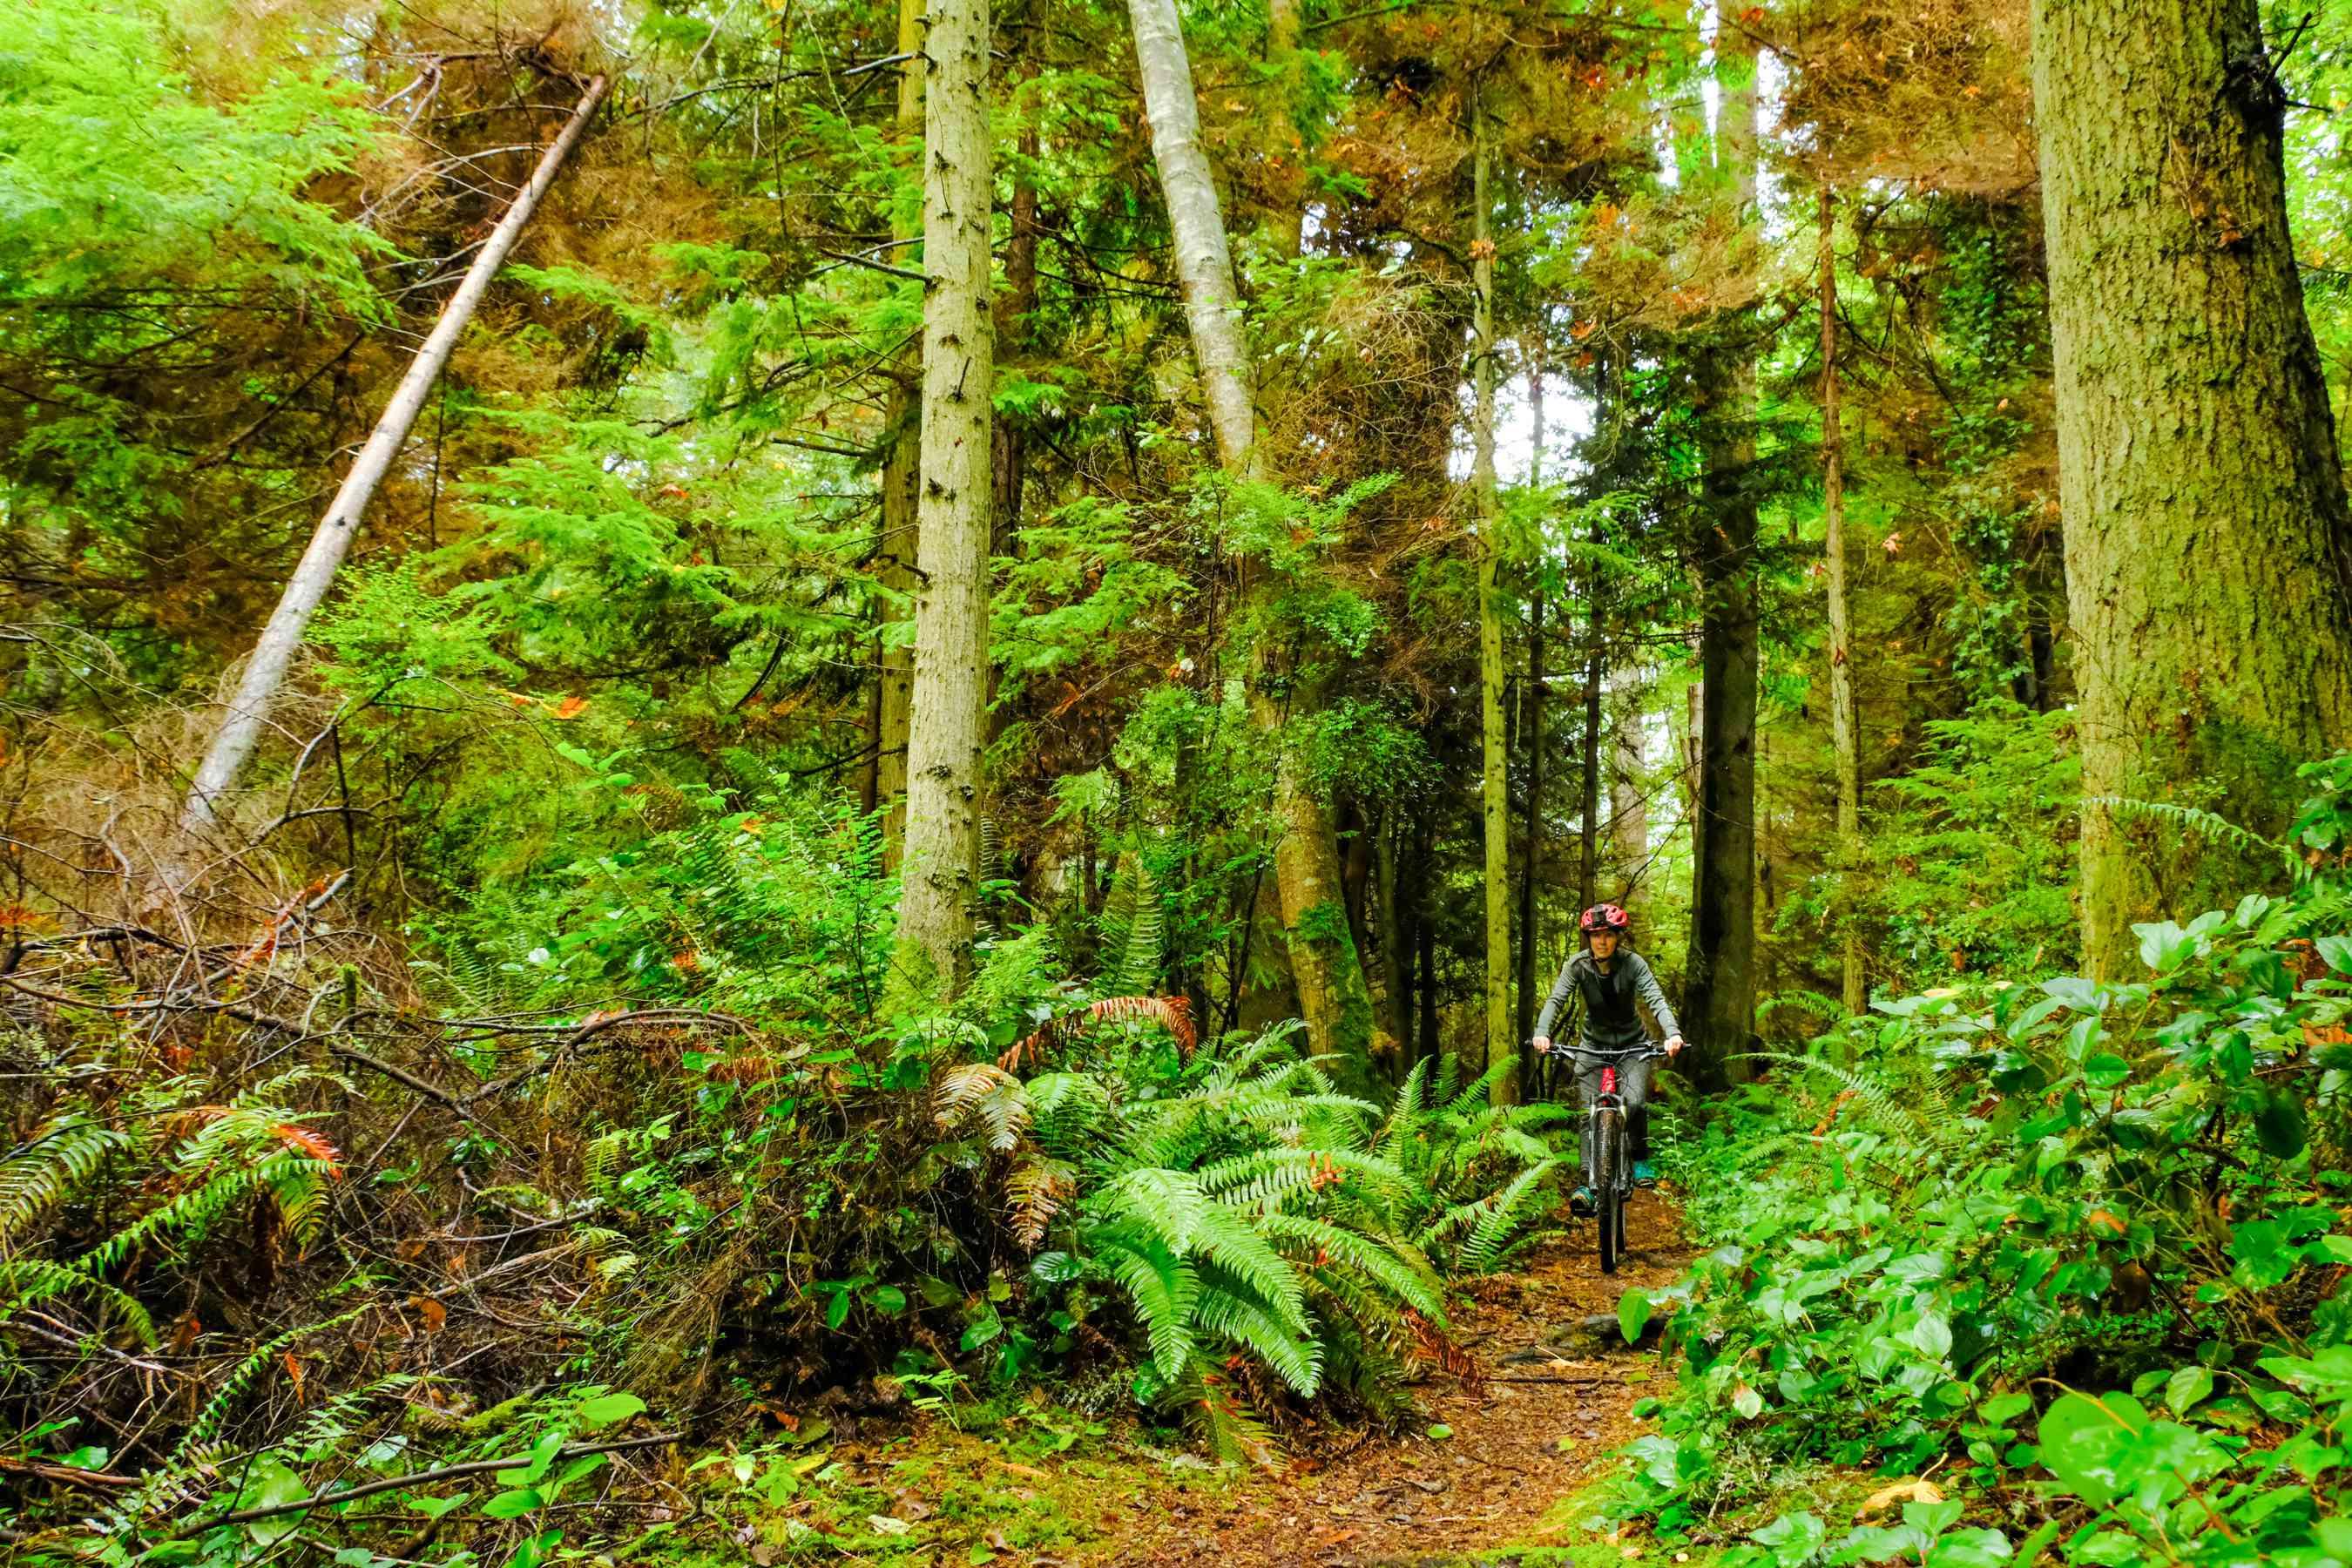 A person biking through the forest on Bainbridge Island